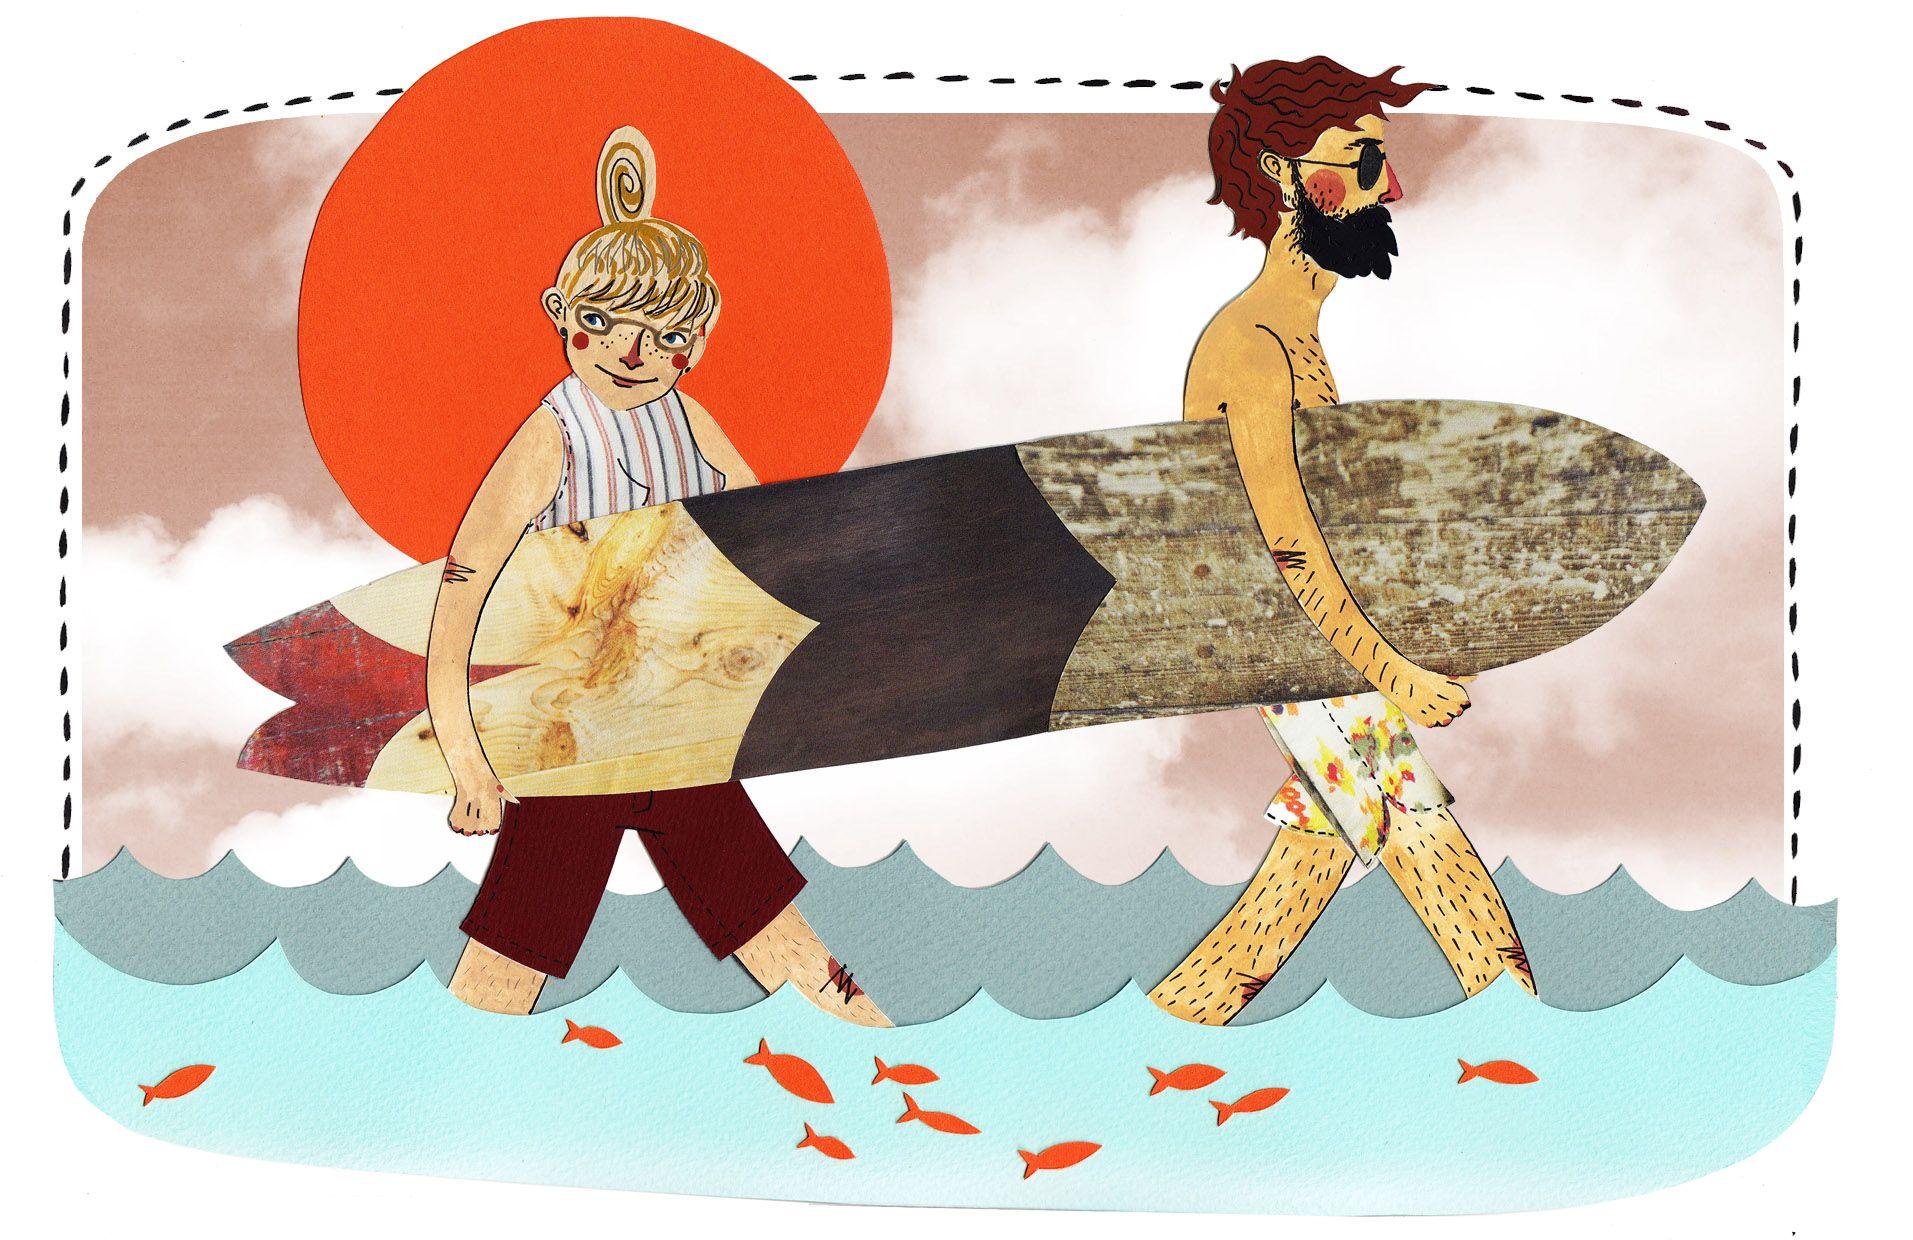 Copyright www.bexbourne.co.uk Bex Bourne illustrator illustration Falmouth collage surfing surfboard sea surf fish longboard sun summer